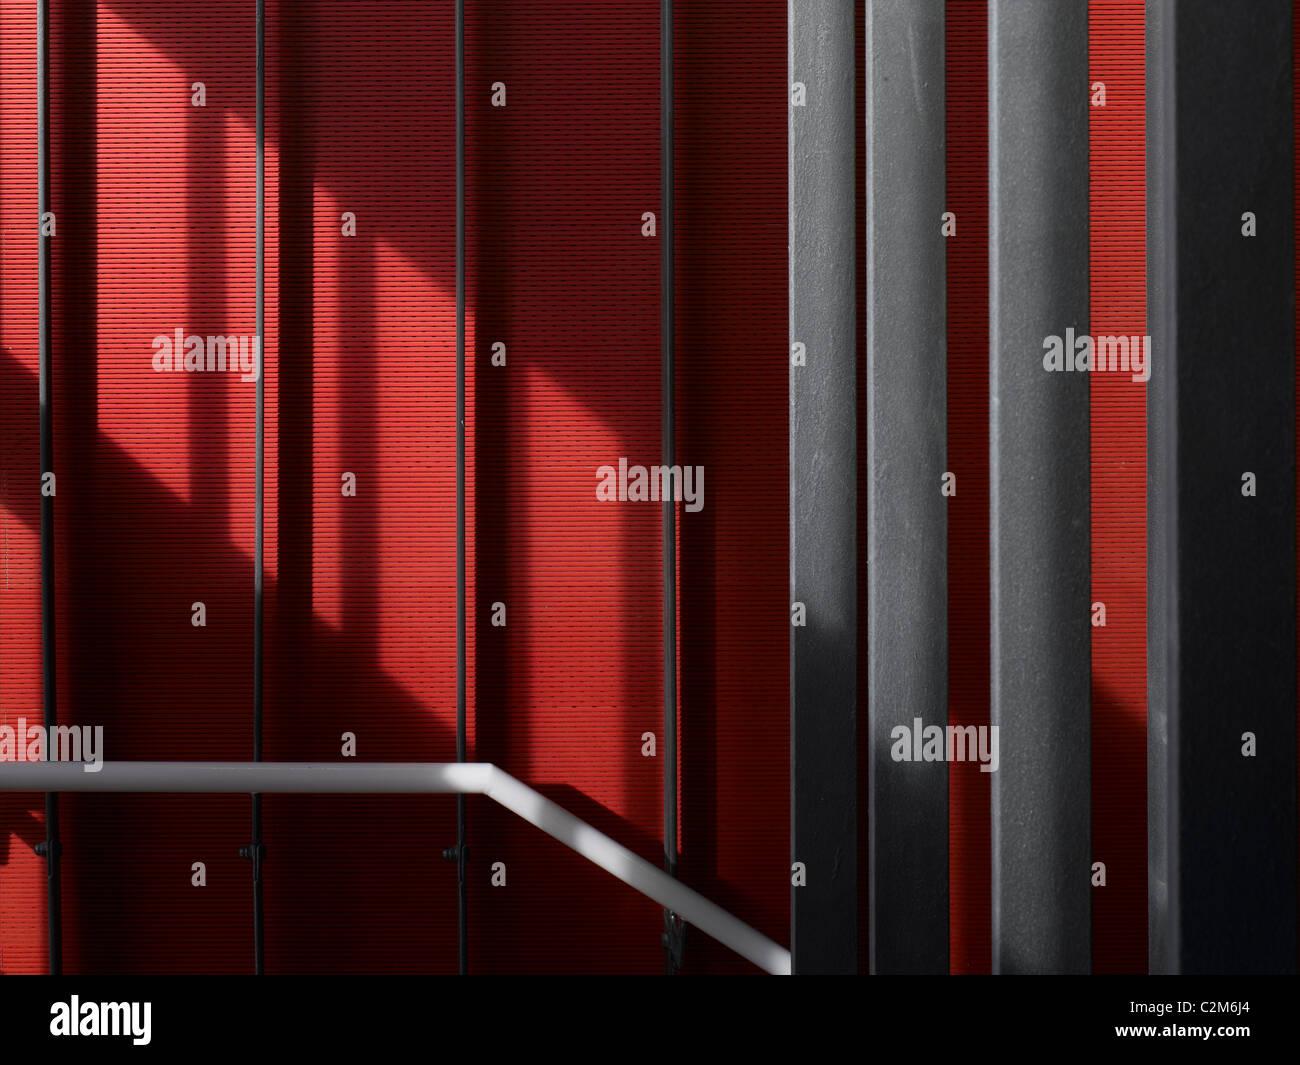 Siobhan Davies Dance Studios, London, 2006. Detail of hanging staircase. - Stock Image